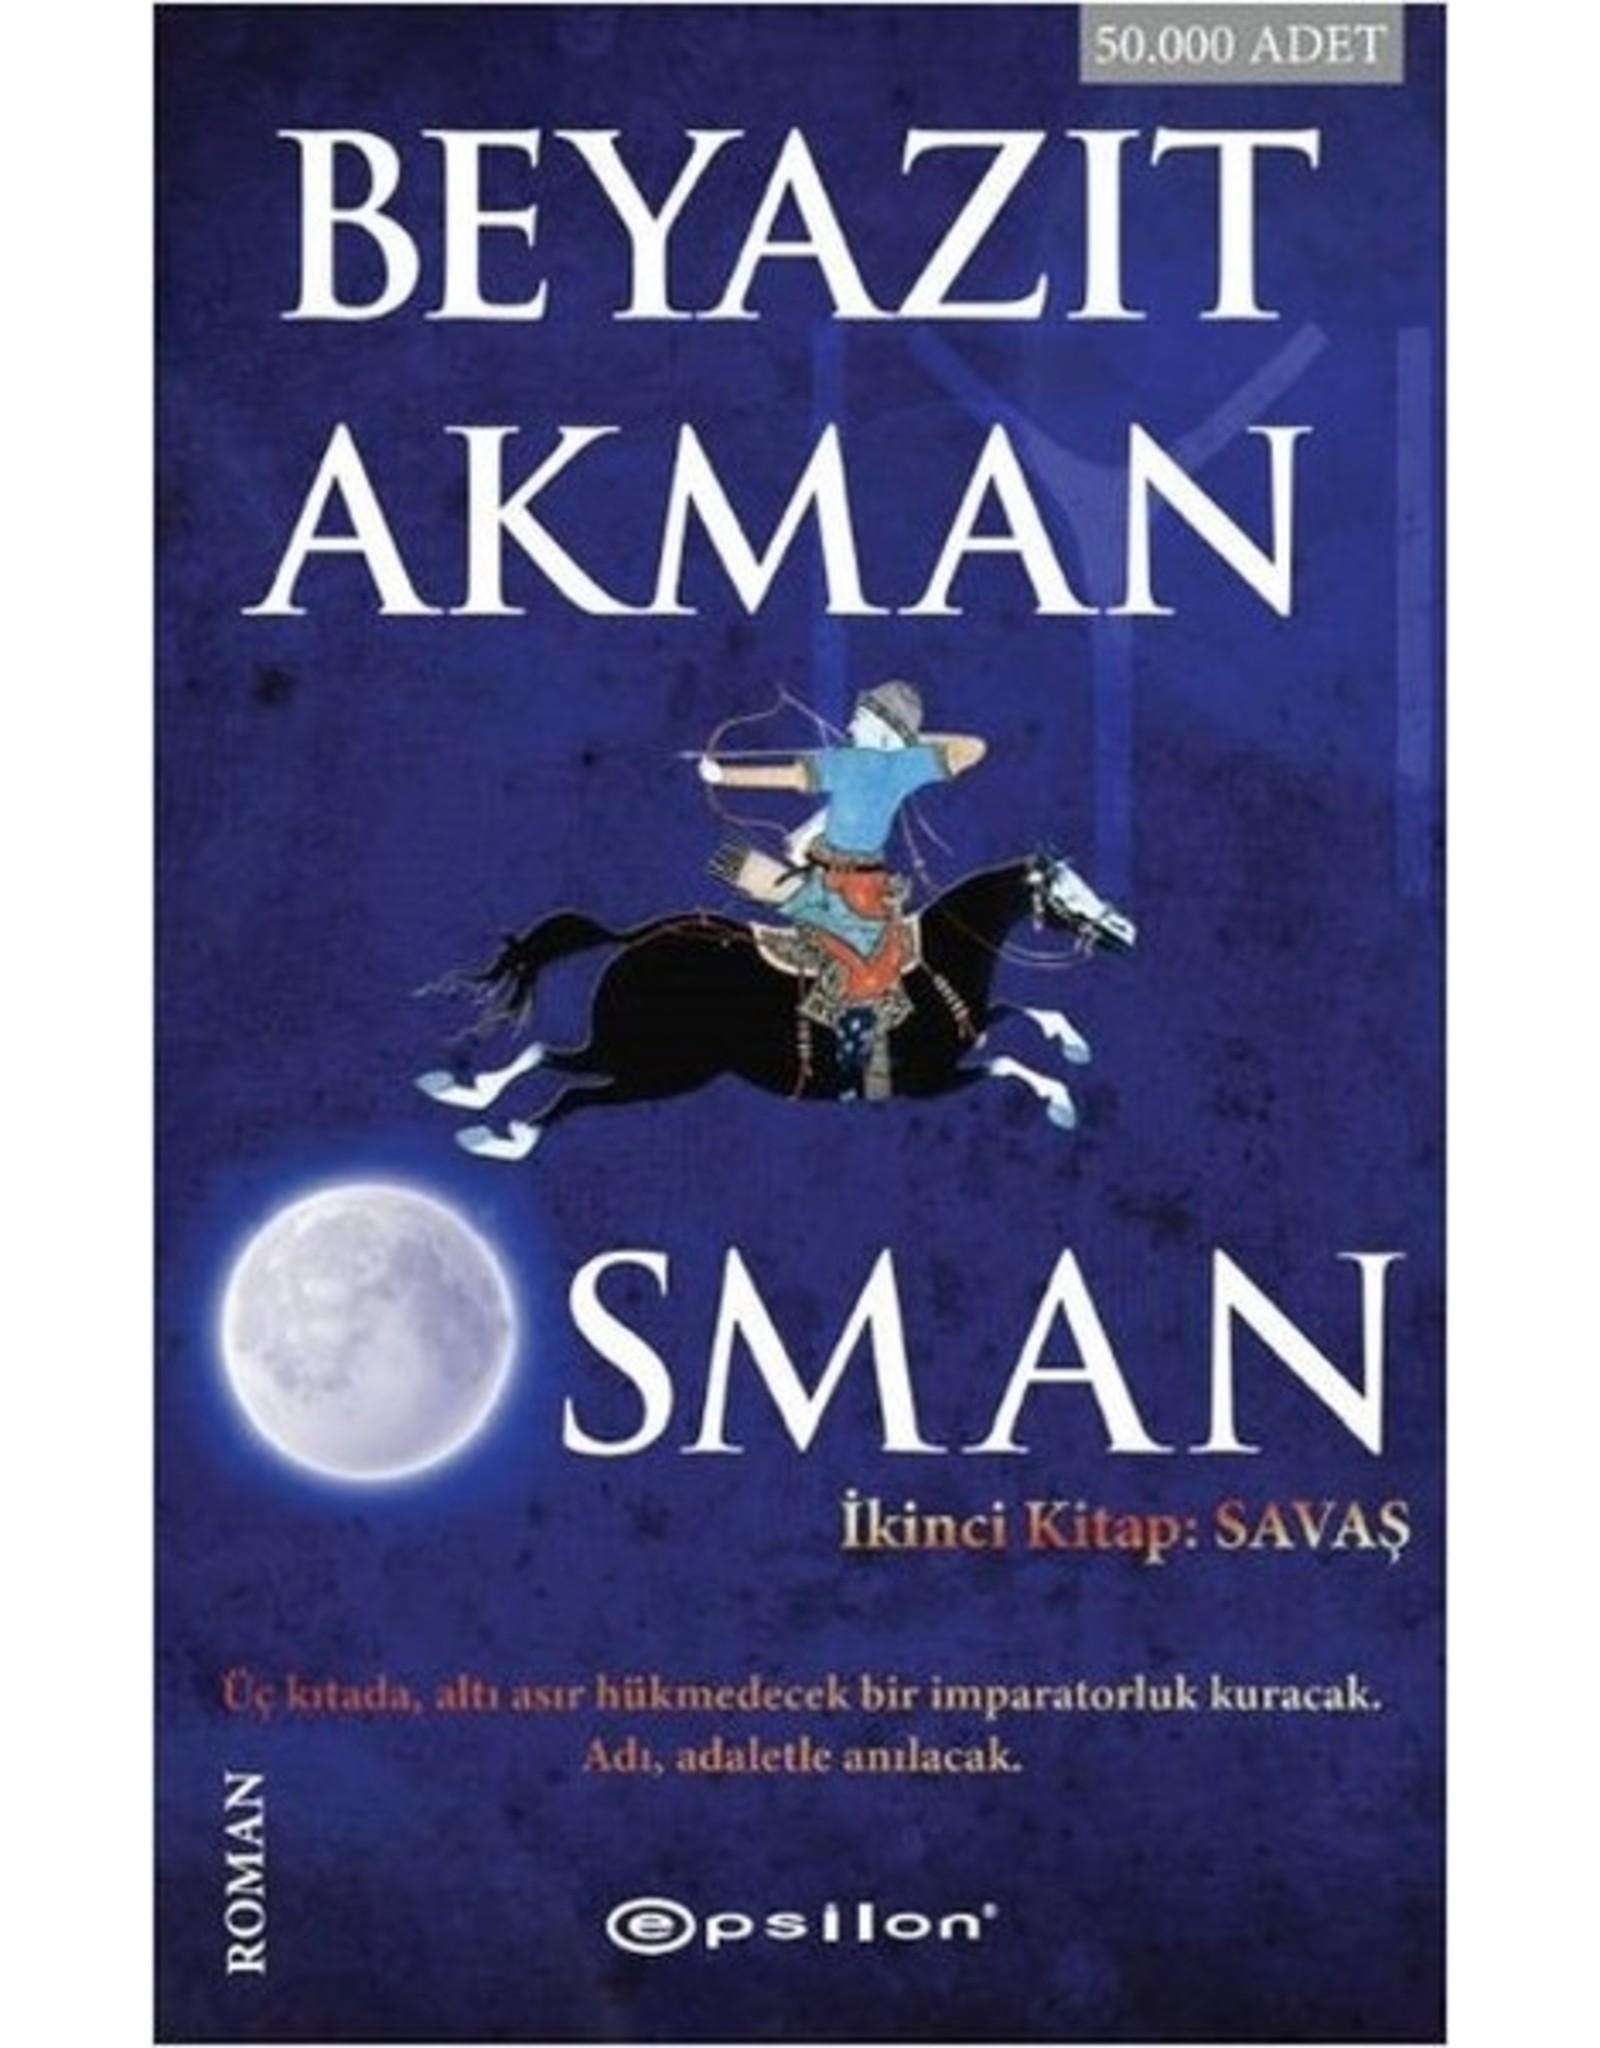 Beyazıt Akman Osman / İkinci Kitap: Savaş